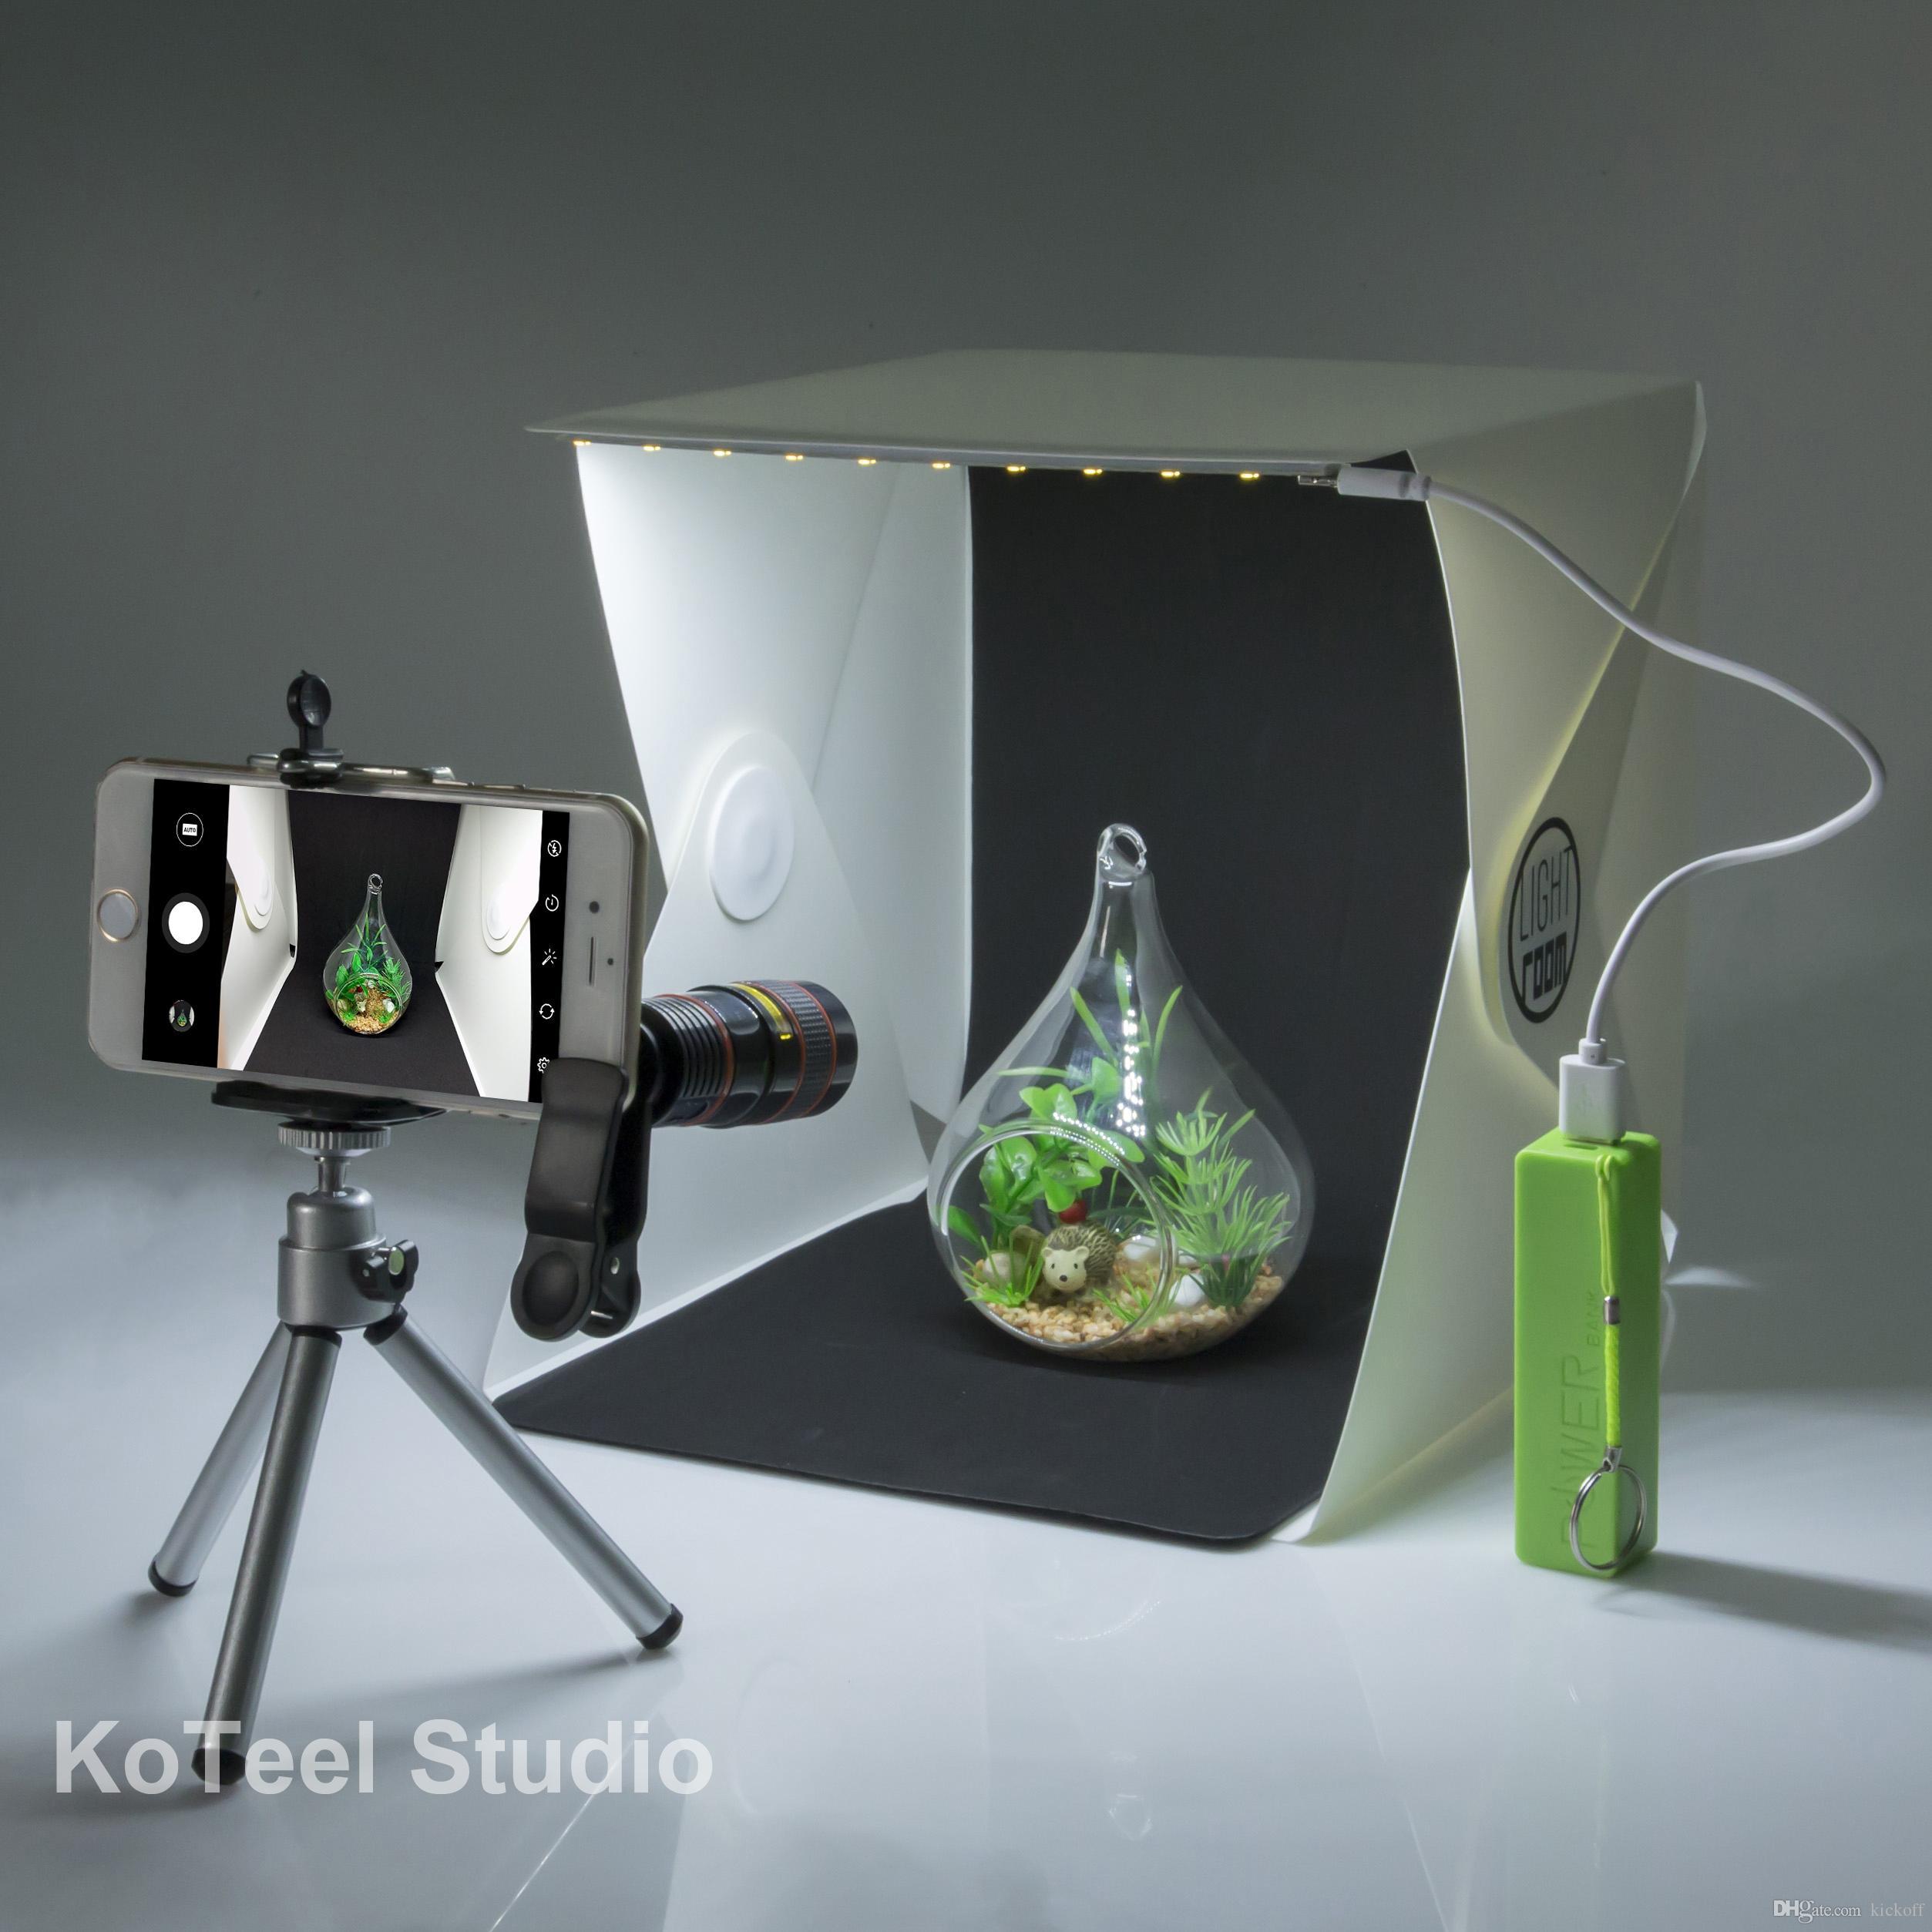 2019 koteel mini photography studio light tent light room light box kit with led lighting two. Black Bedroom Furniture Sets. Home Design Ideas